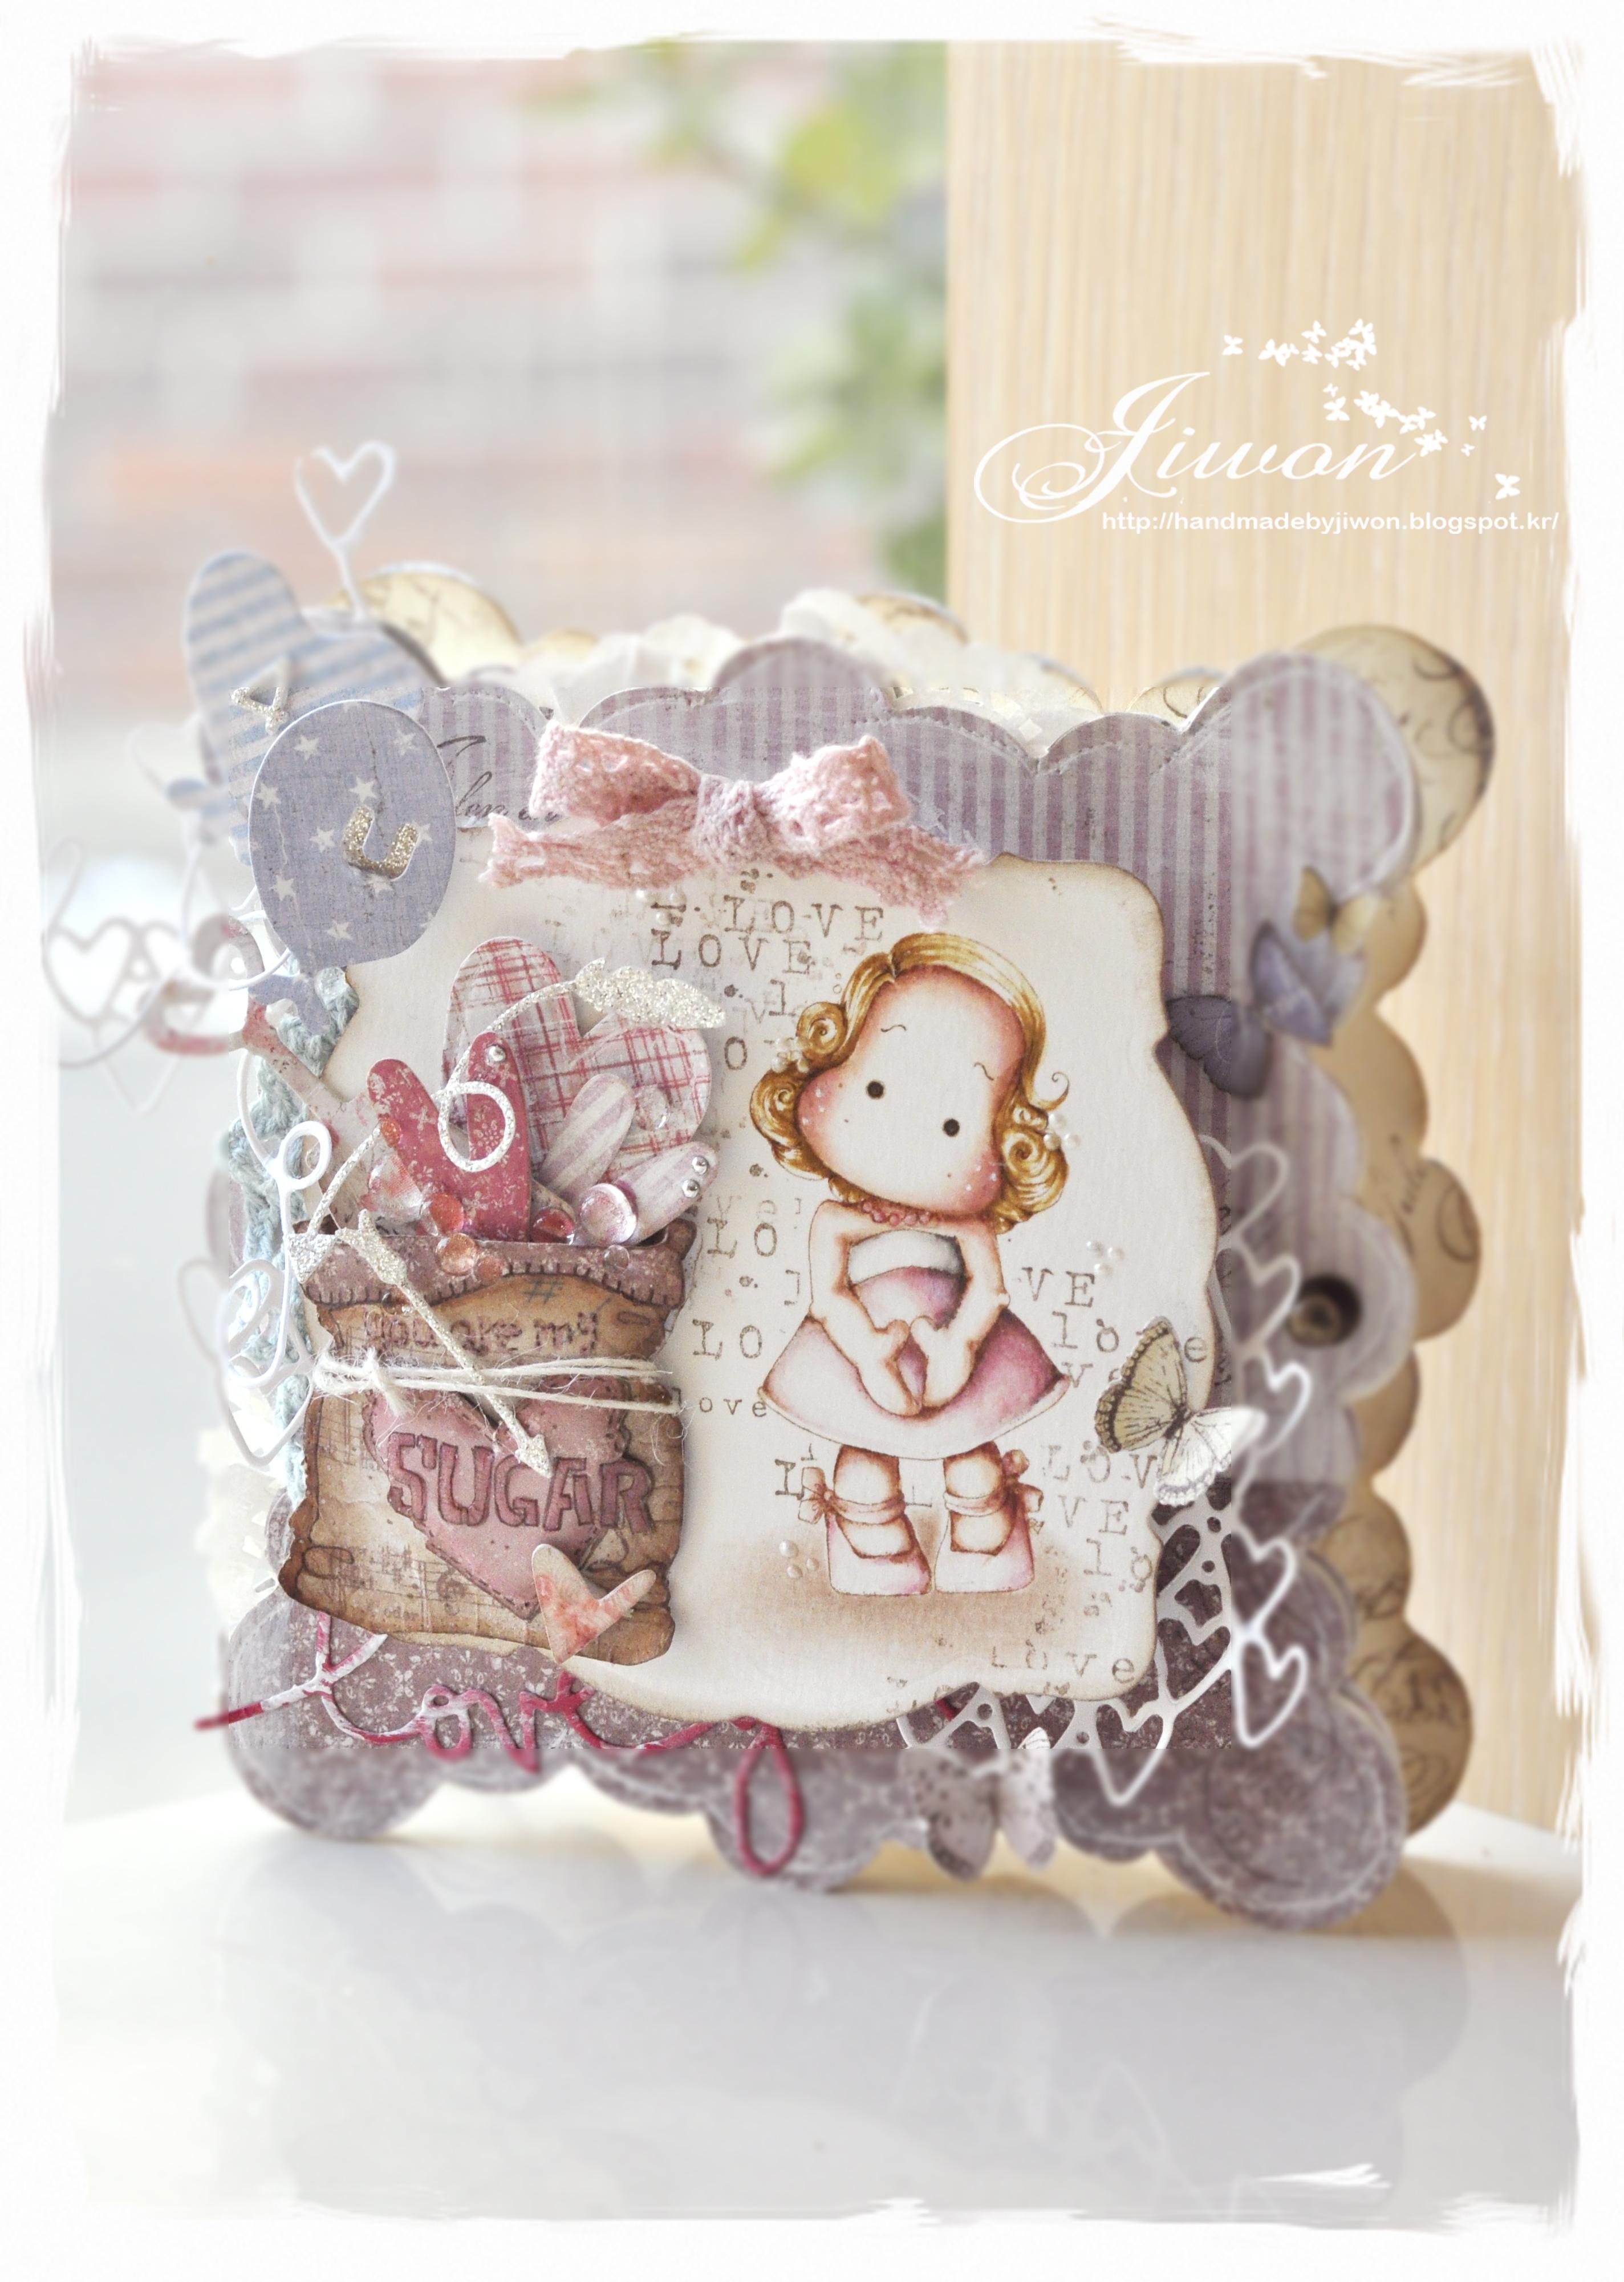 ValentineDay Chocolate box